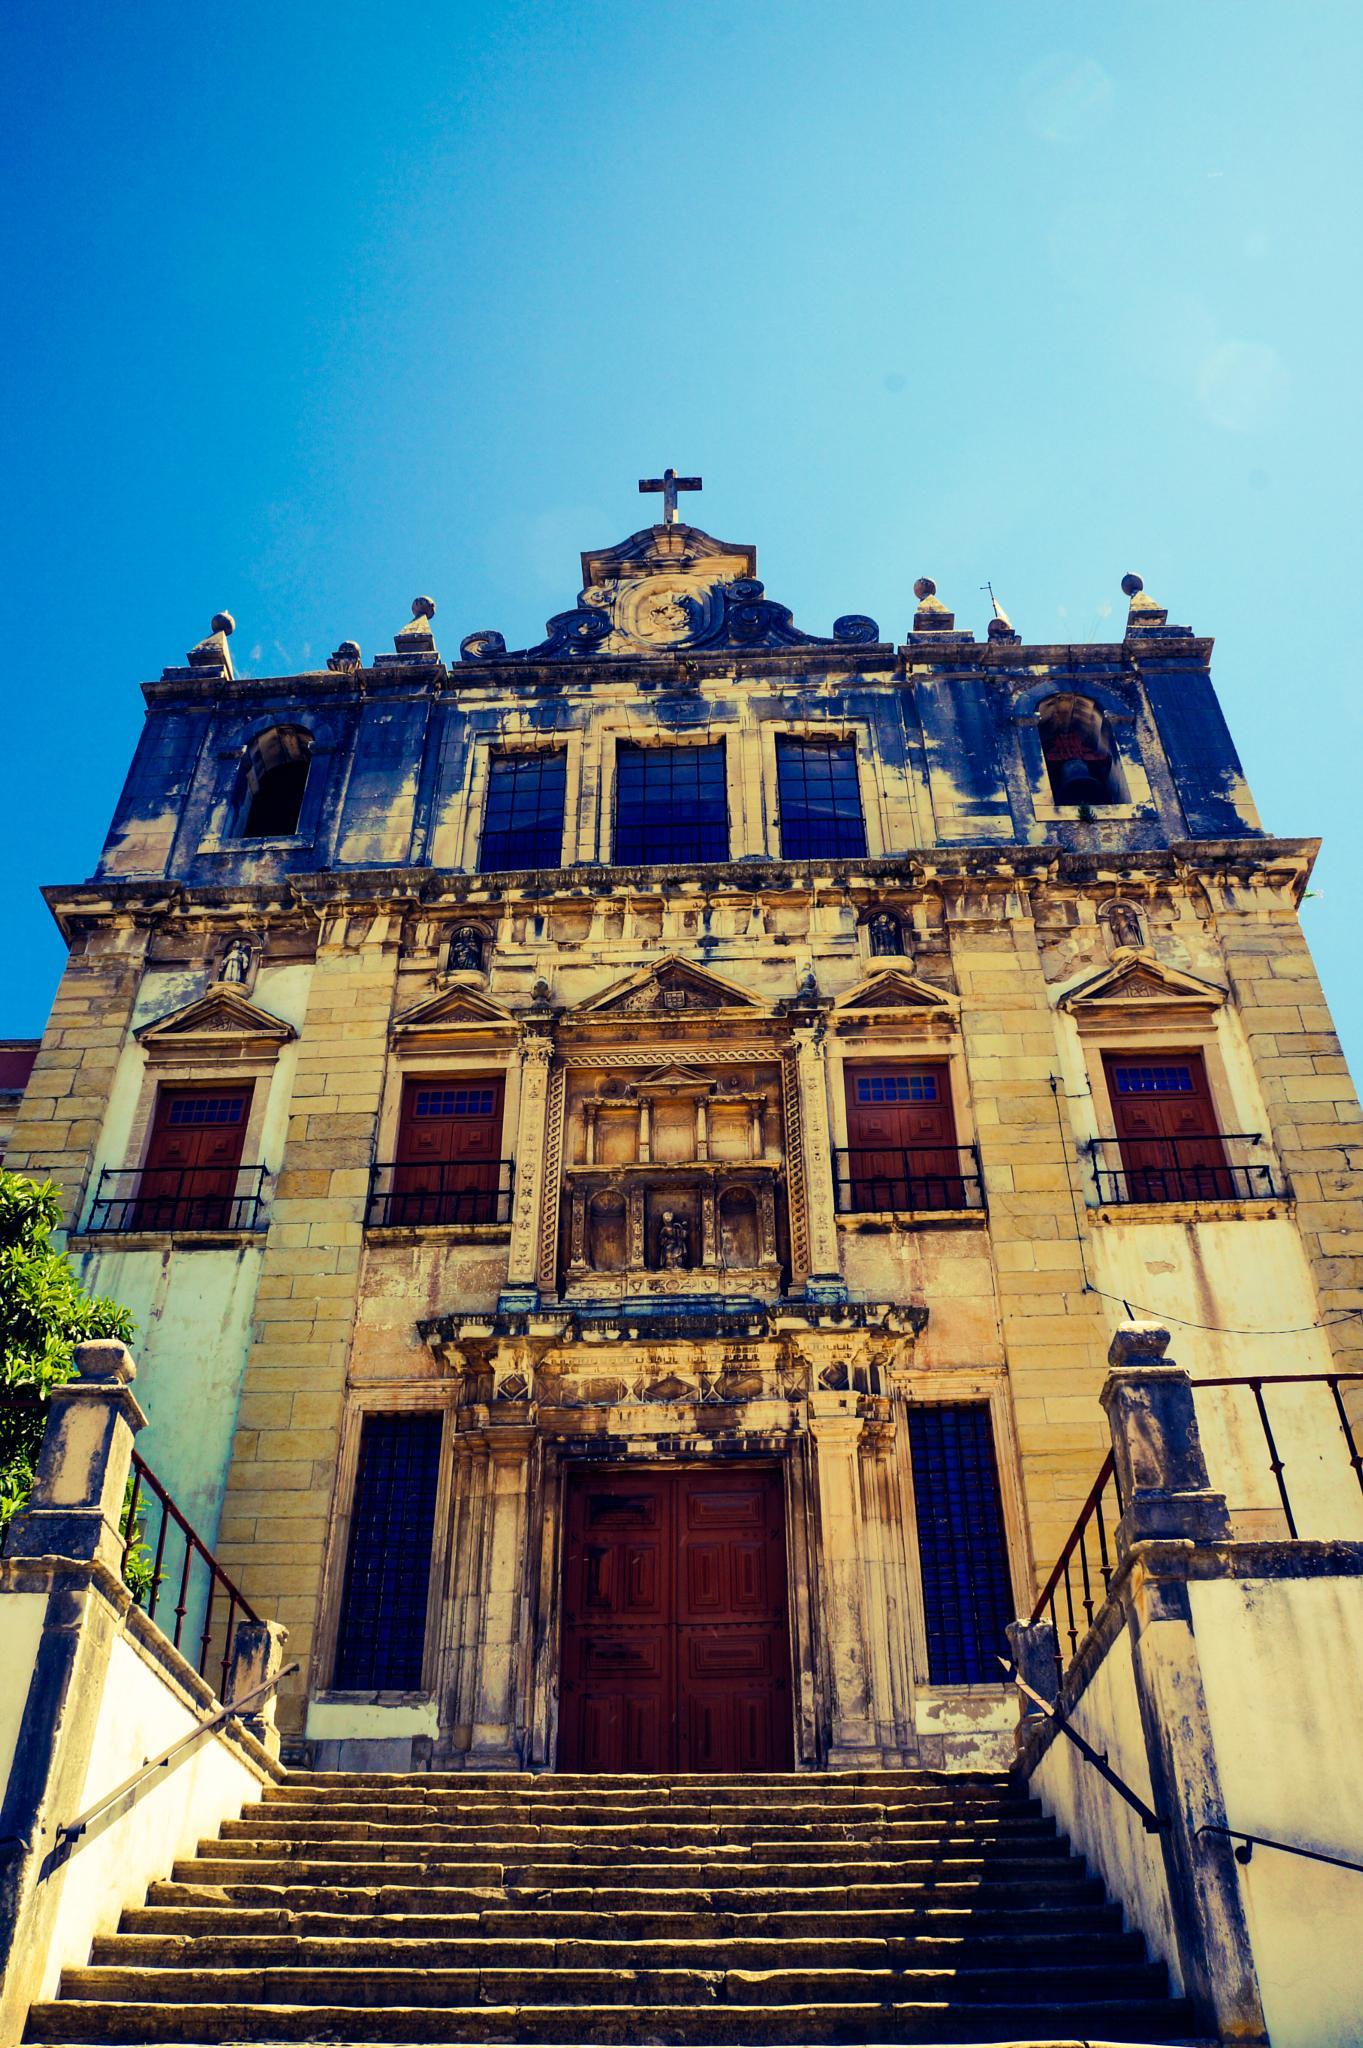 Igreja de Santa Justa em Coimbra by Miguel Angelo